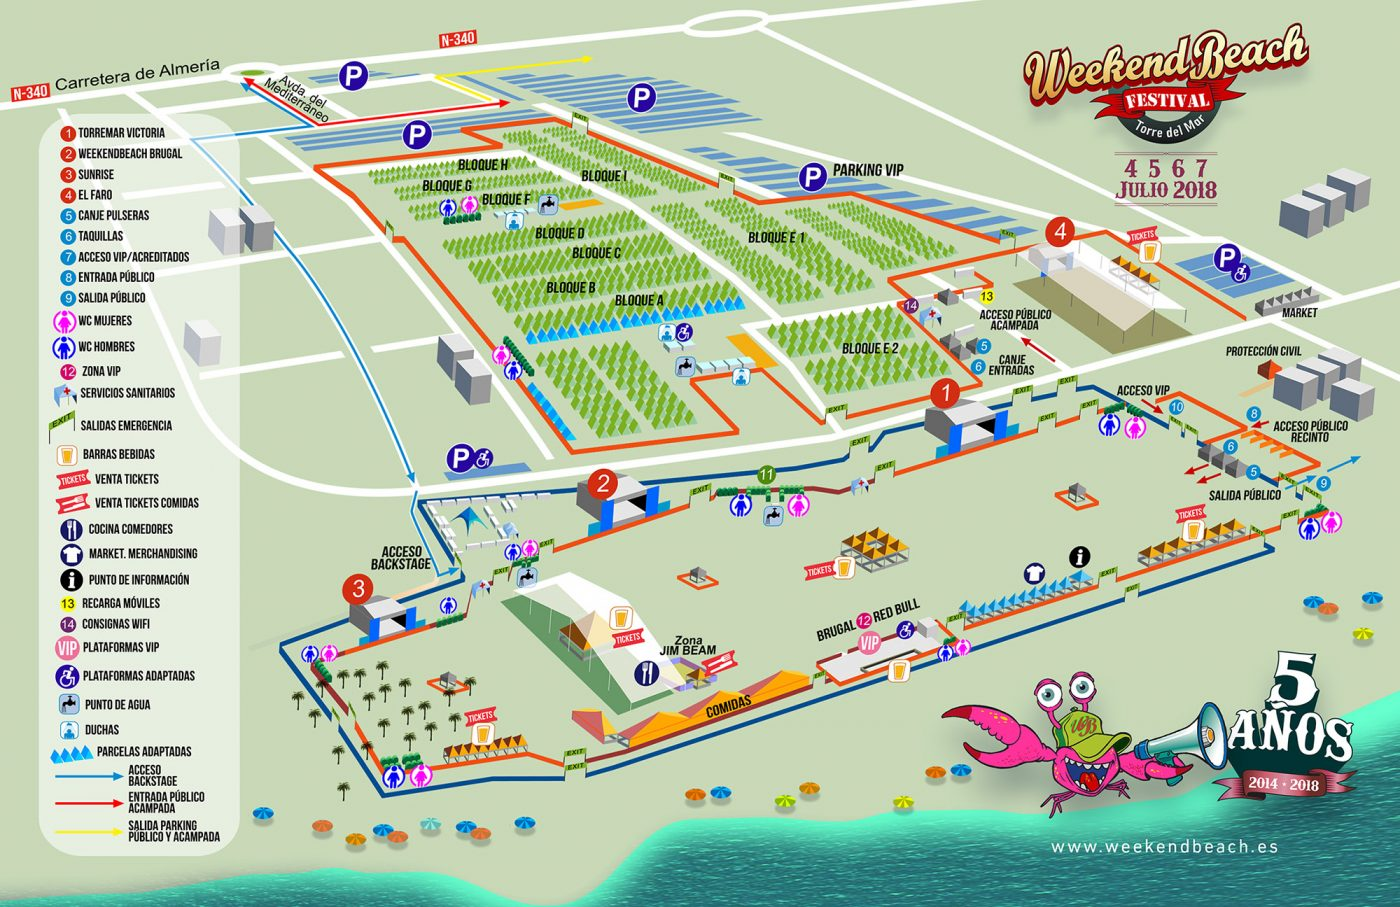 PLANO_WEEKENDBEACH_2018-1 Todo listo para Weekend Beach Festival 2018